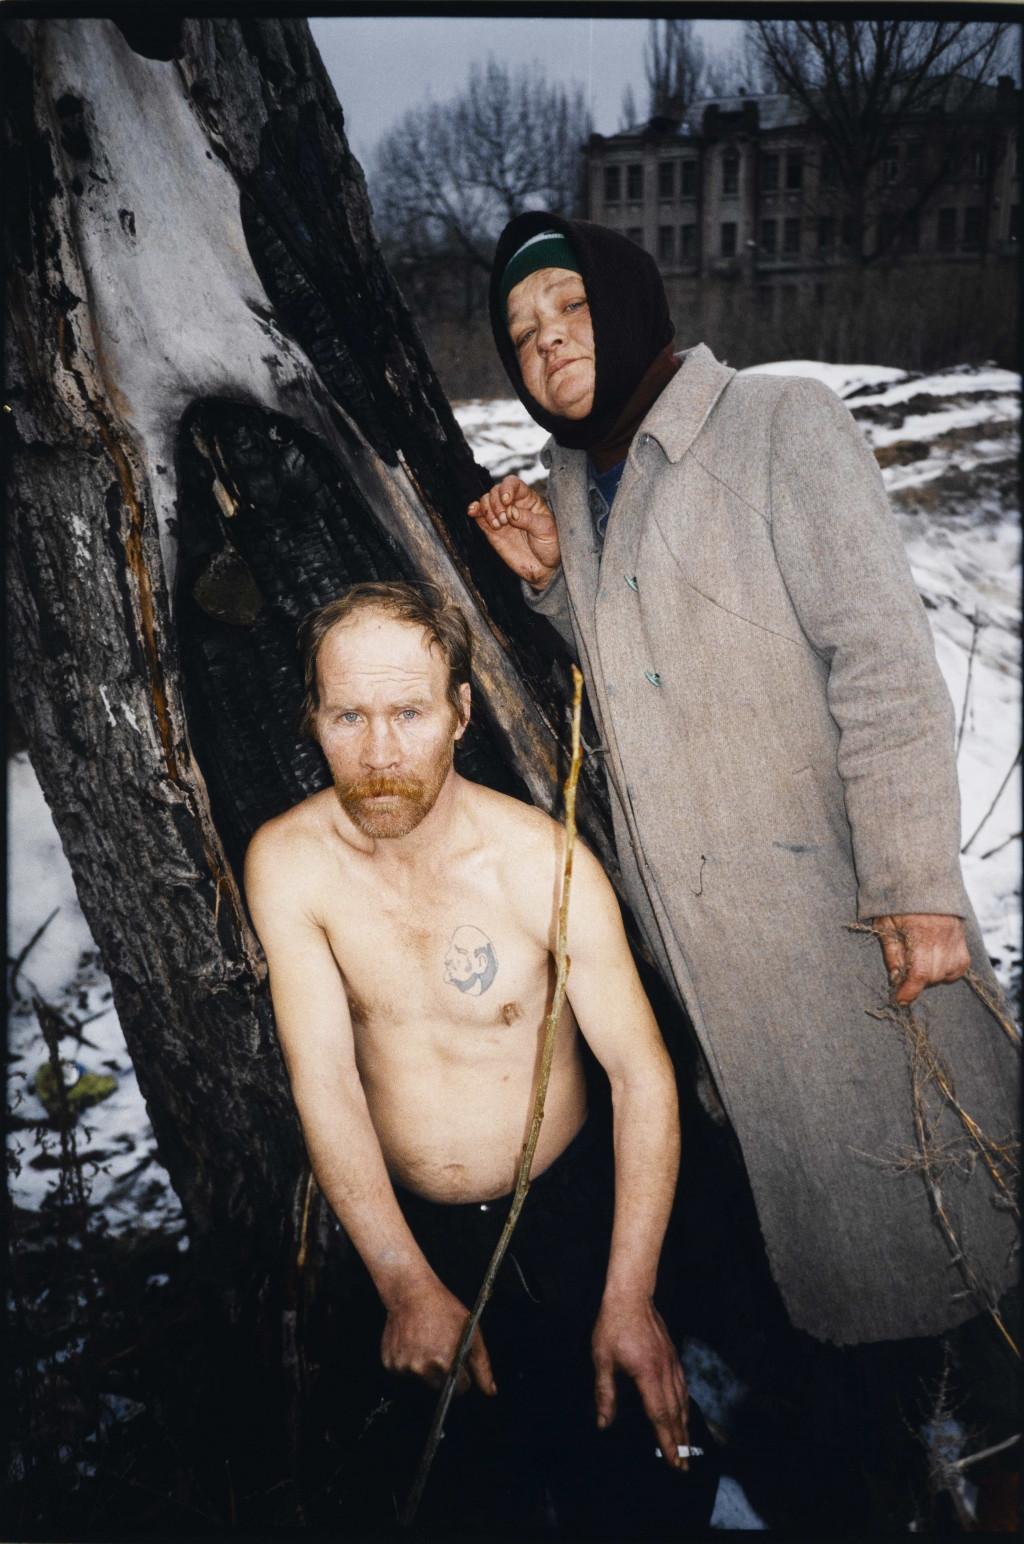 Boris Mikhailov, Charkov, 1998. c/o Pictoright Amsterdam. Collection Stedelijk Museum Amsterdam, gift from the artist